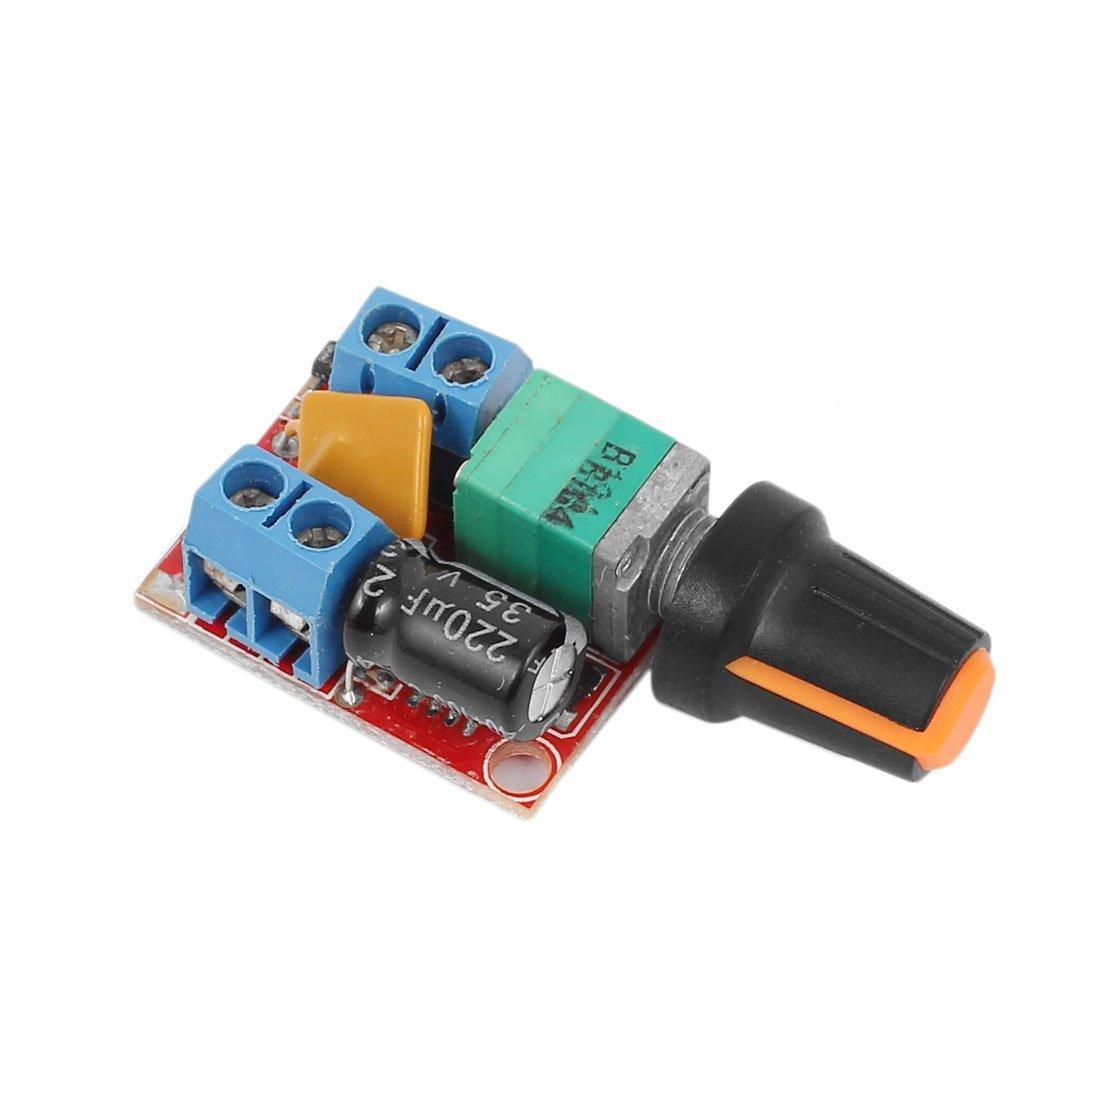 WINGONEER DC Motor Speed Control Driver Board 3V-35V 5A PWM Controller Stepless DC 3V 6V 12V 24V 35V Variable Voltage Regulator Dimmer Governor Switching Build with LED Indicator and Switch Function